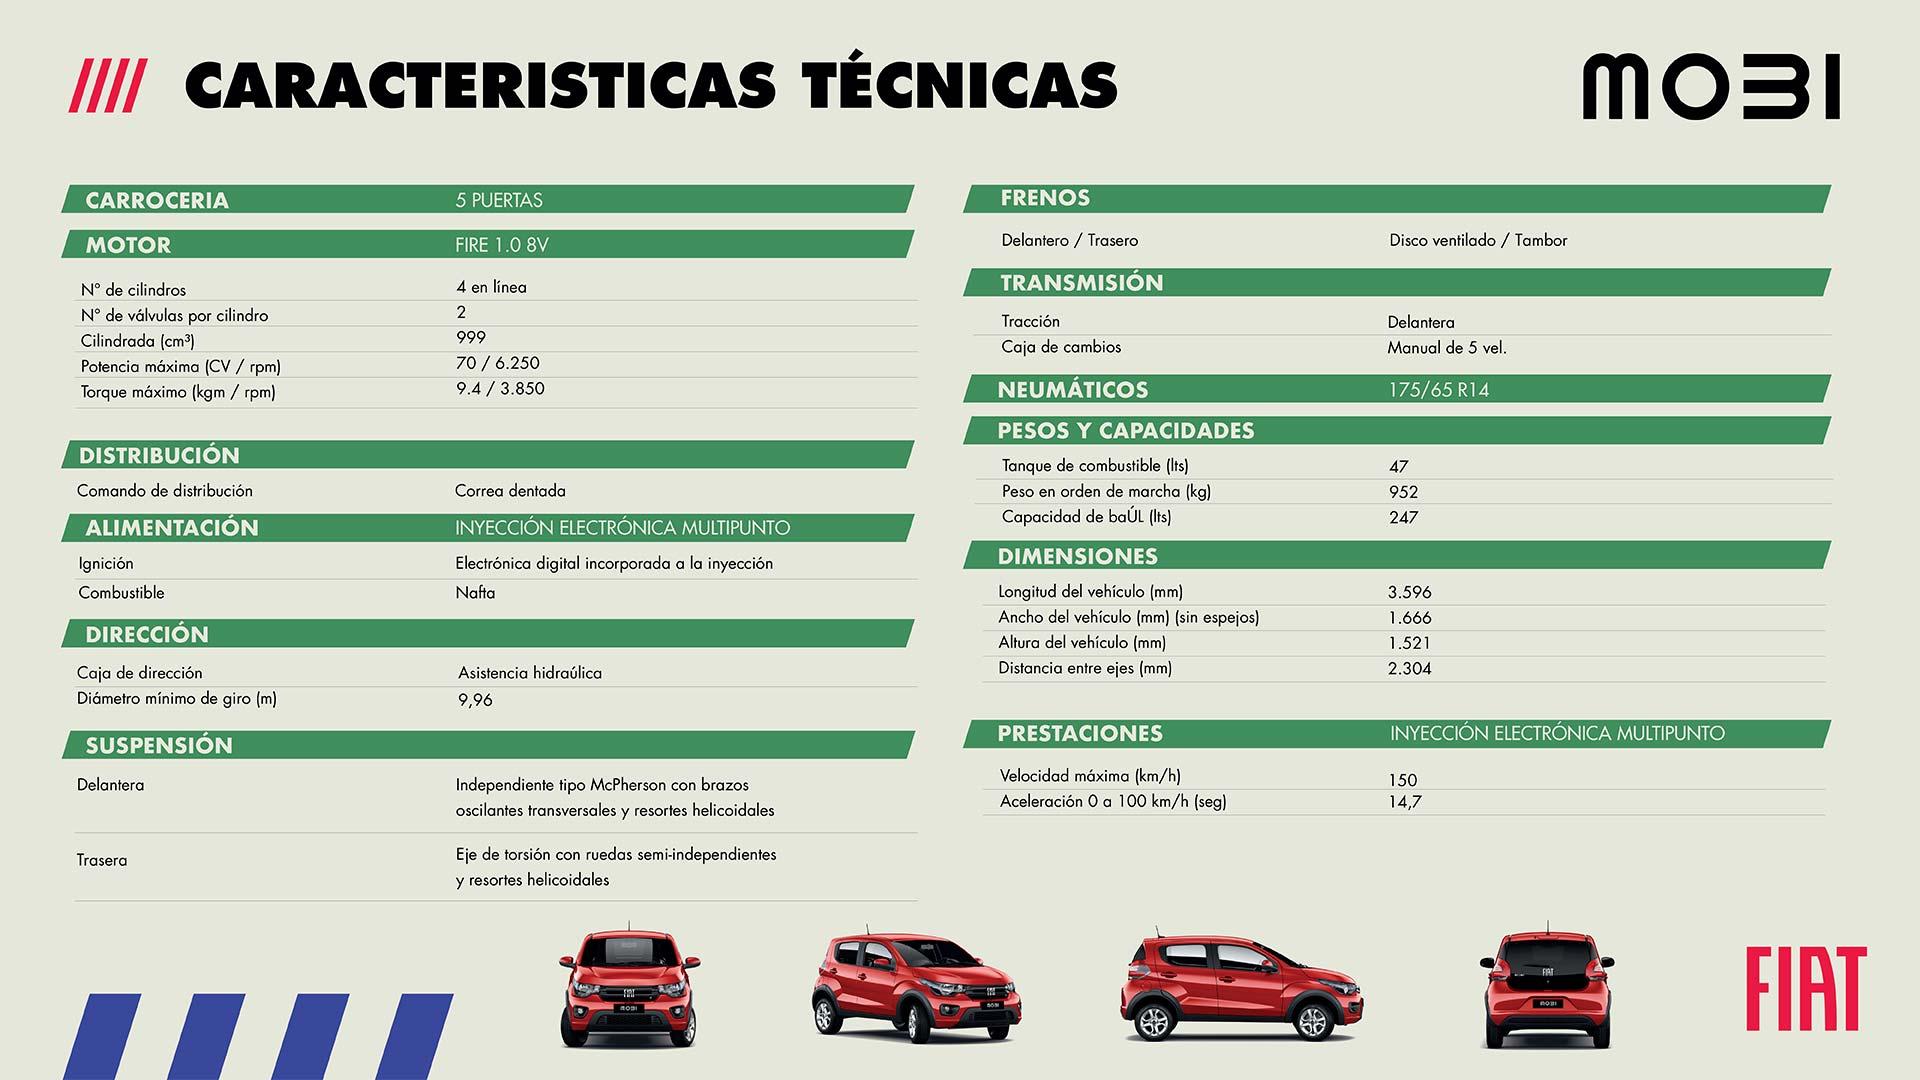 Ficha técnica Fiat Mobi 2021